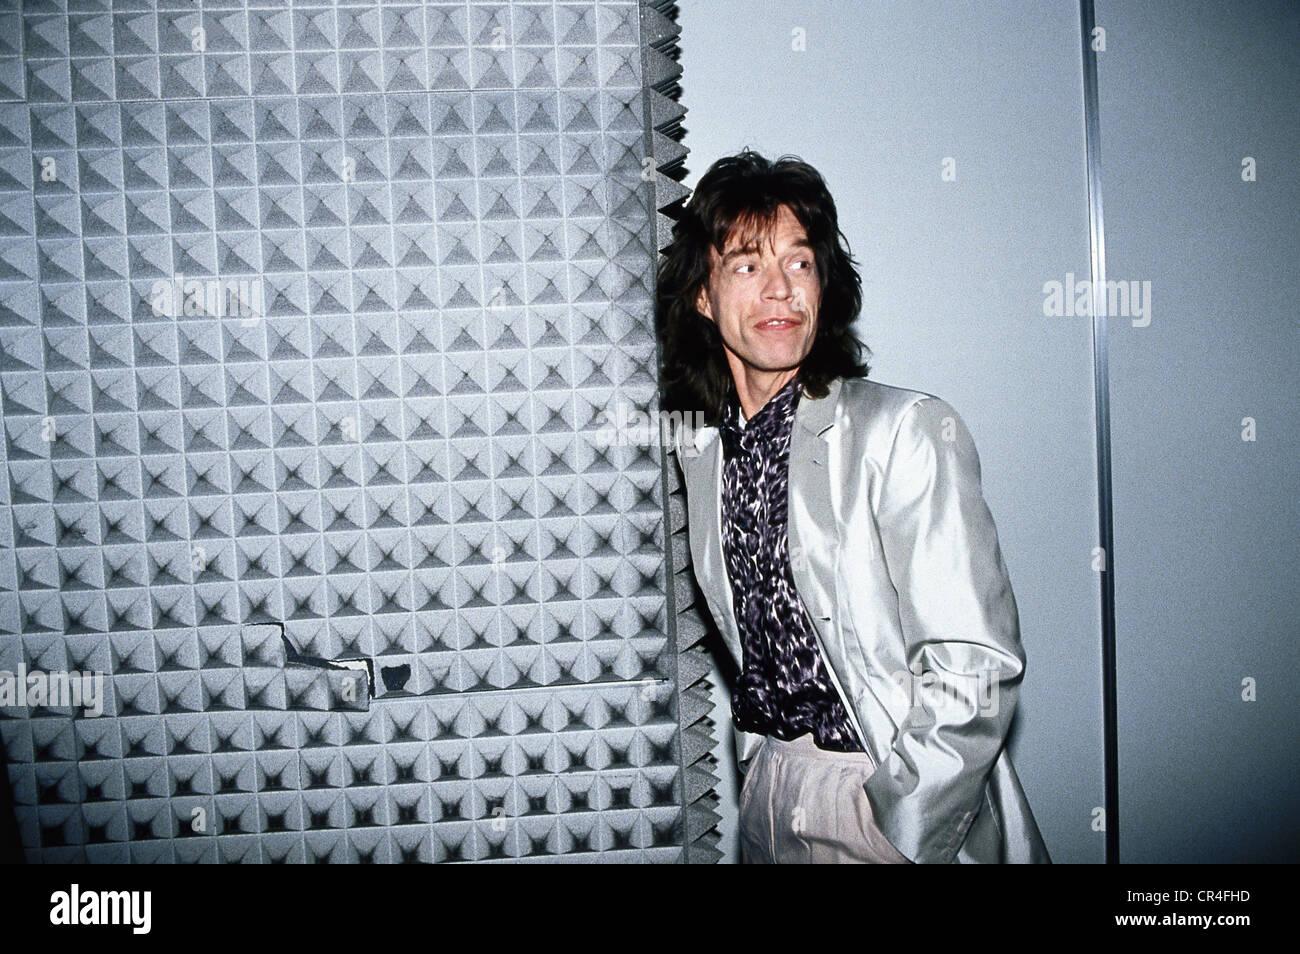 Jagger, Mick, * 26.7.1943, British musician, half length, receiving the Golden Record for 'Wandering Spirit', - Stock Image